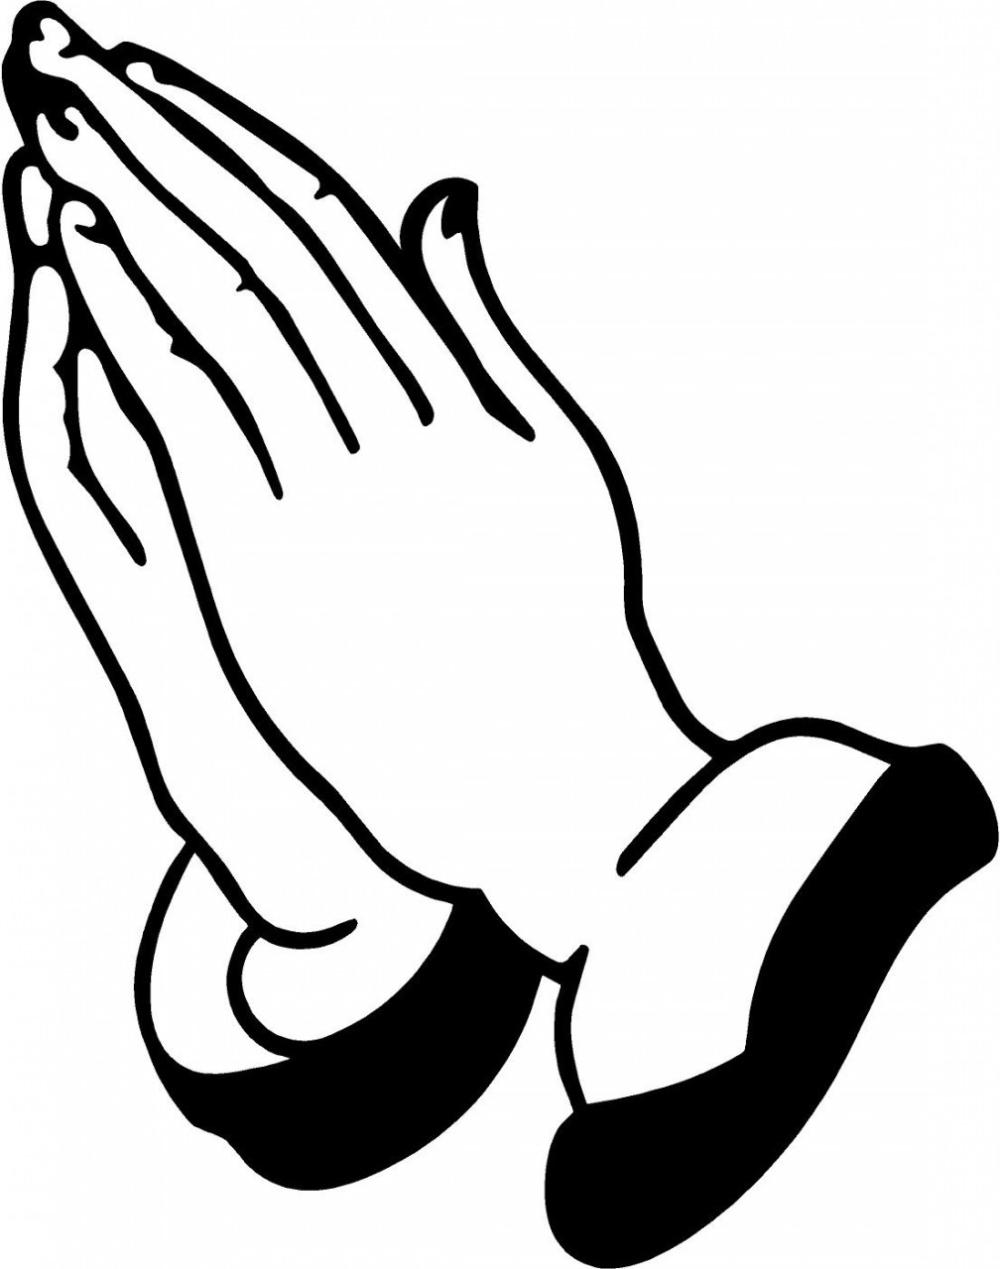 Best Custom Shirts Socks Mugs Personalized Gifts Onyx Prints Praying Hands Tattoo Design Praying Hands Tattoo Prayer Hands Tattoo